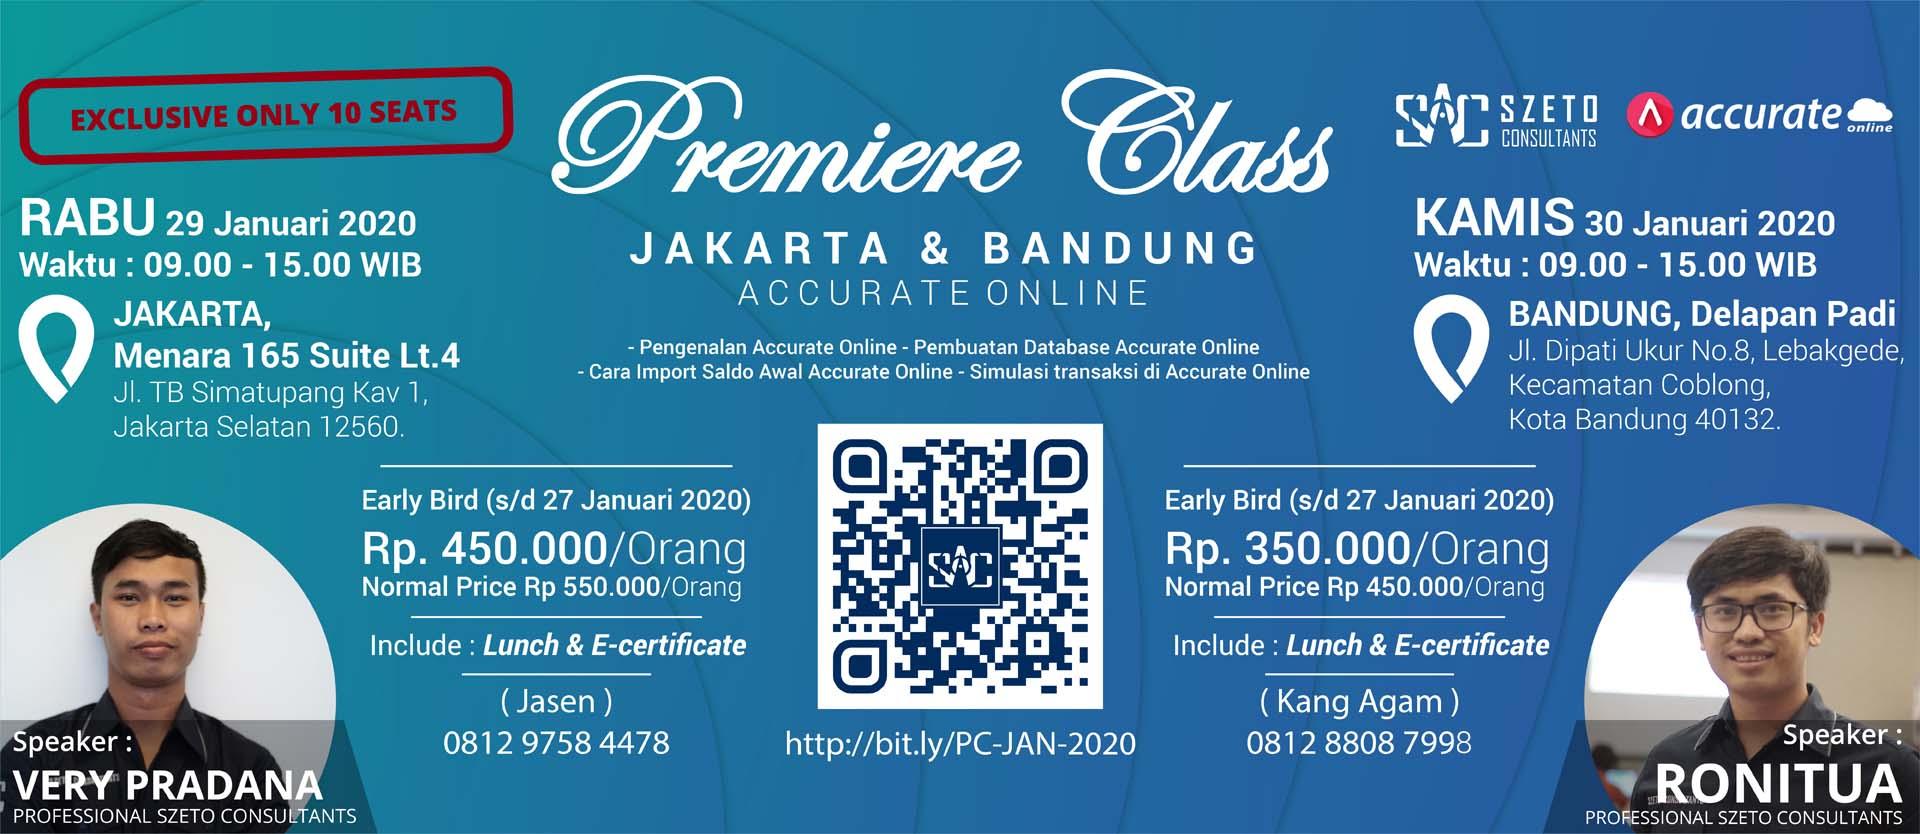 WEB_Premiere Class Accurate Online_1920 X 834-min